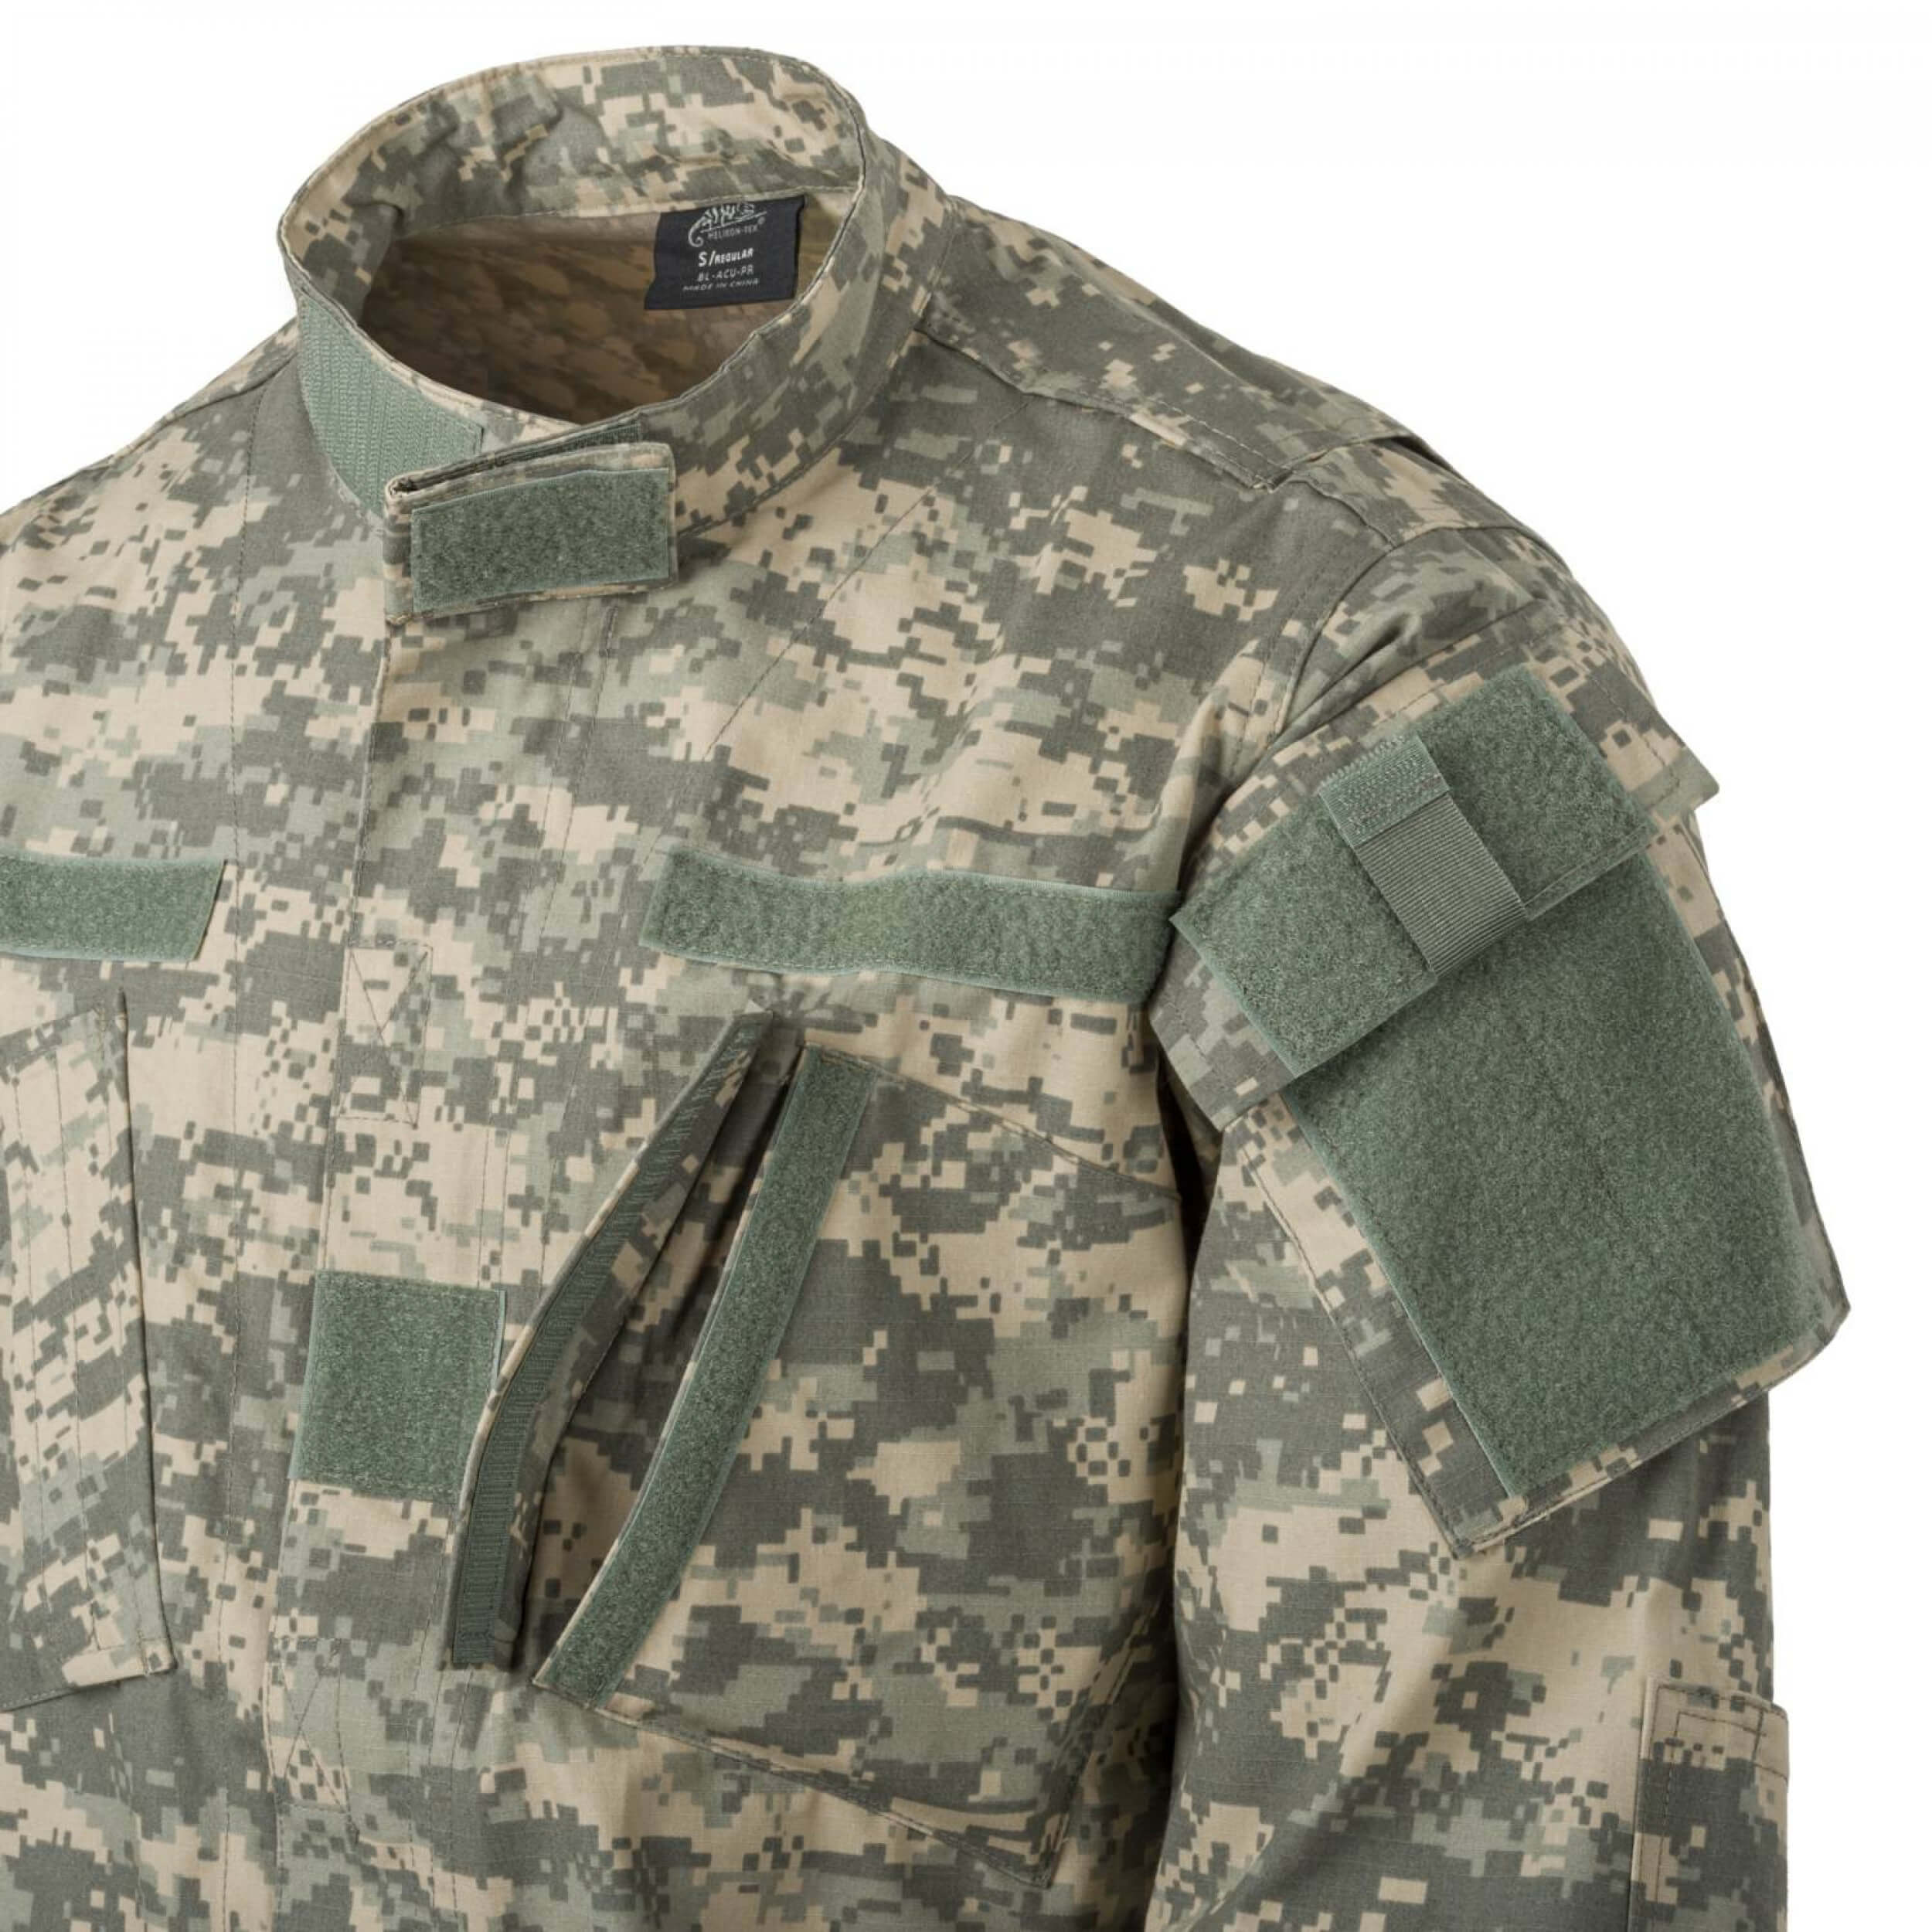 Helikon-Tex ACU Shirt -PolyCotton Ripstop- UCP